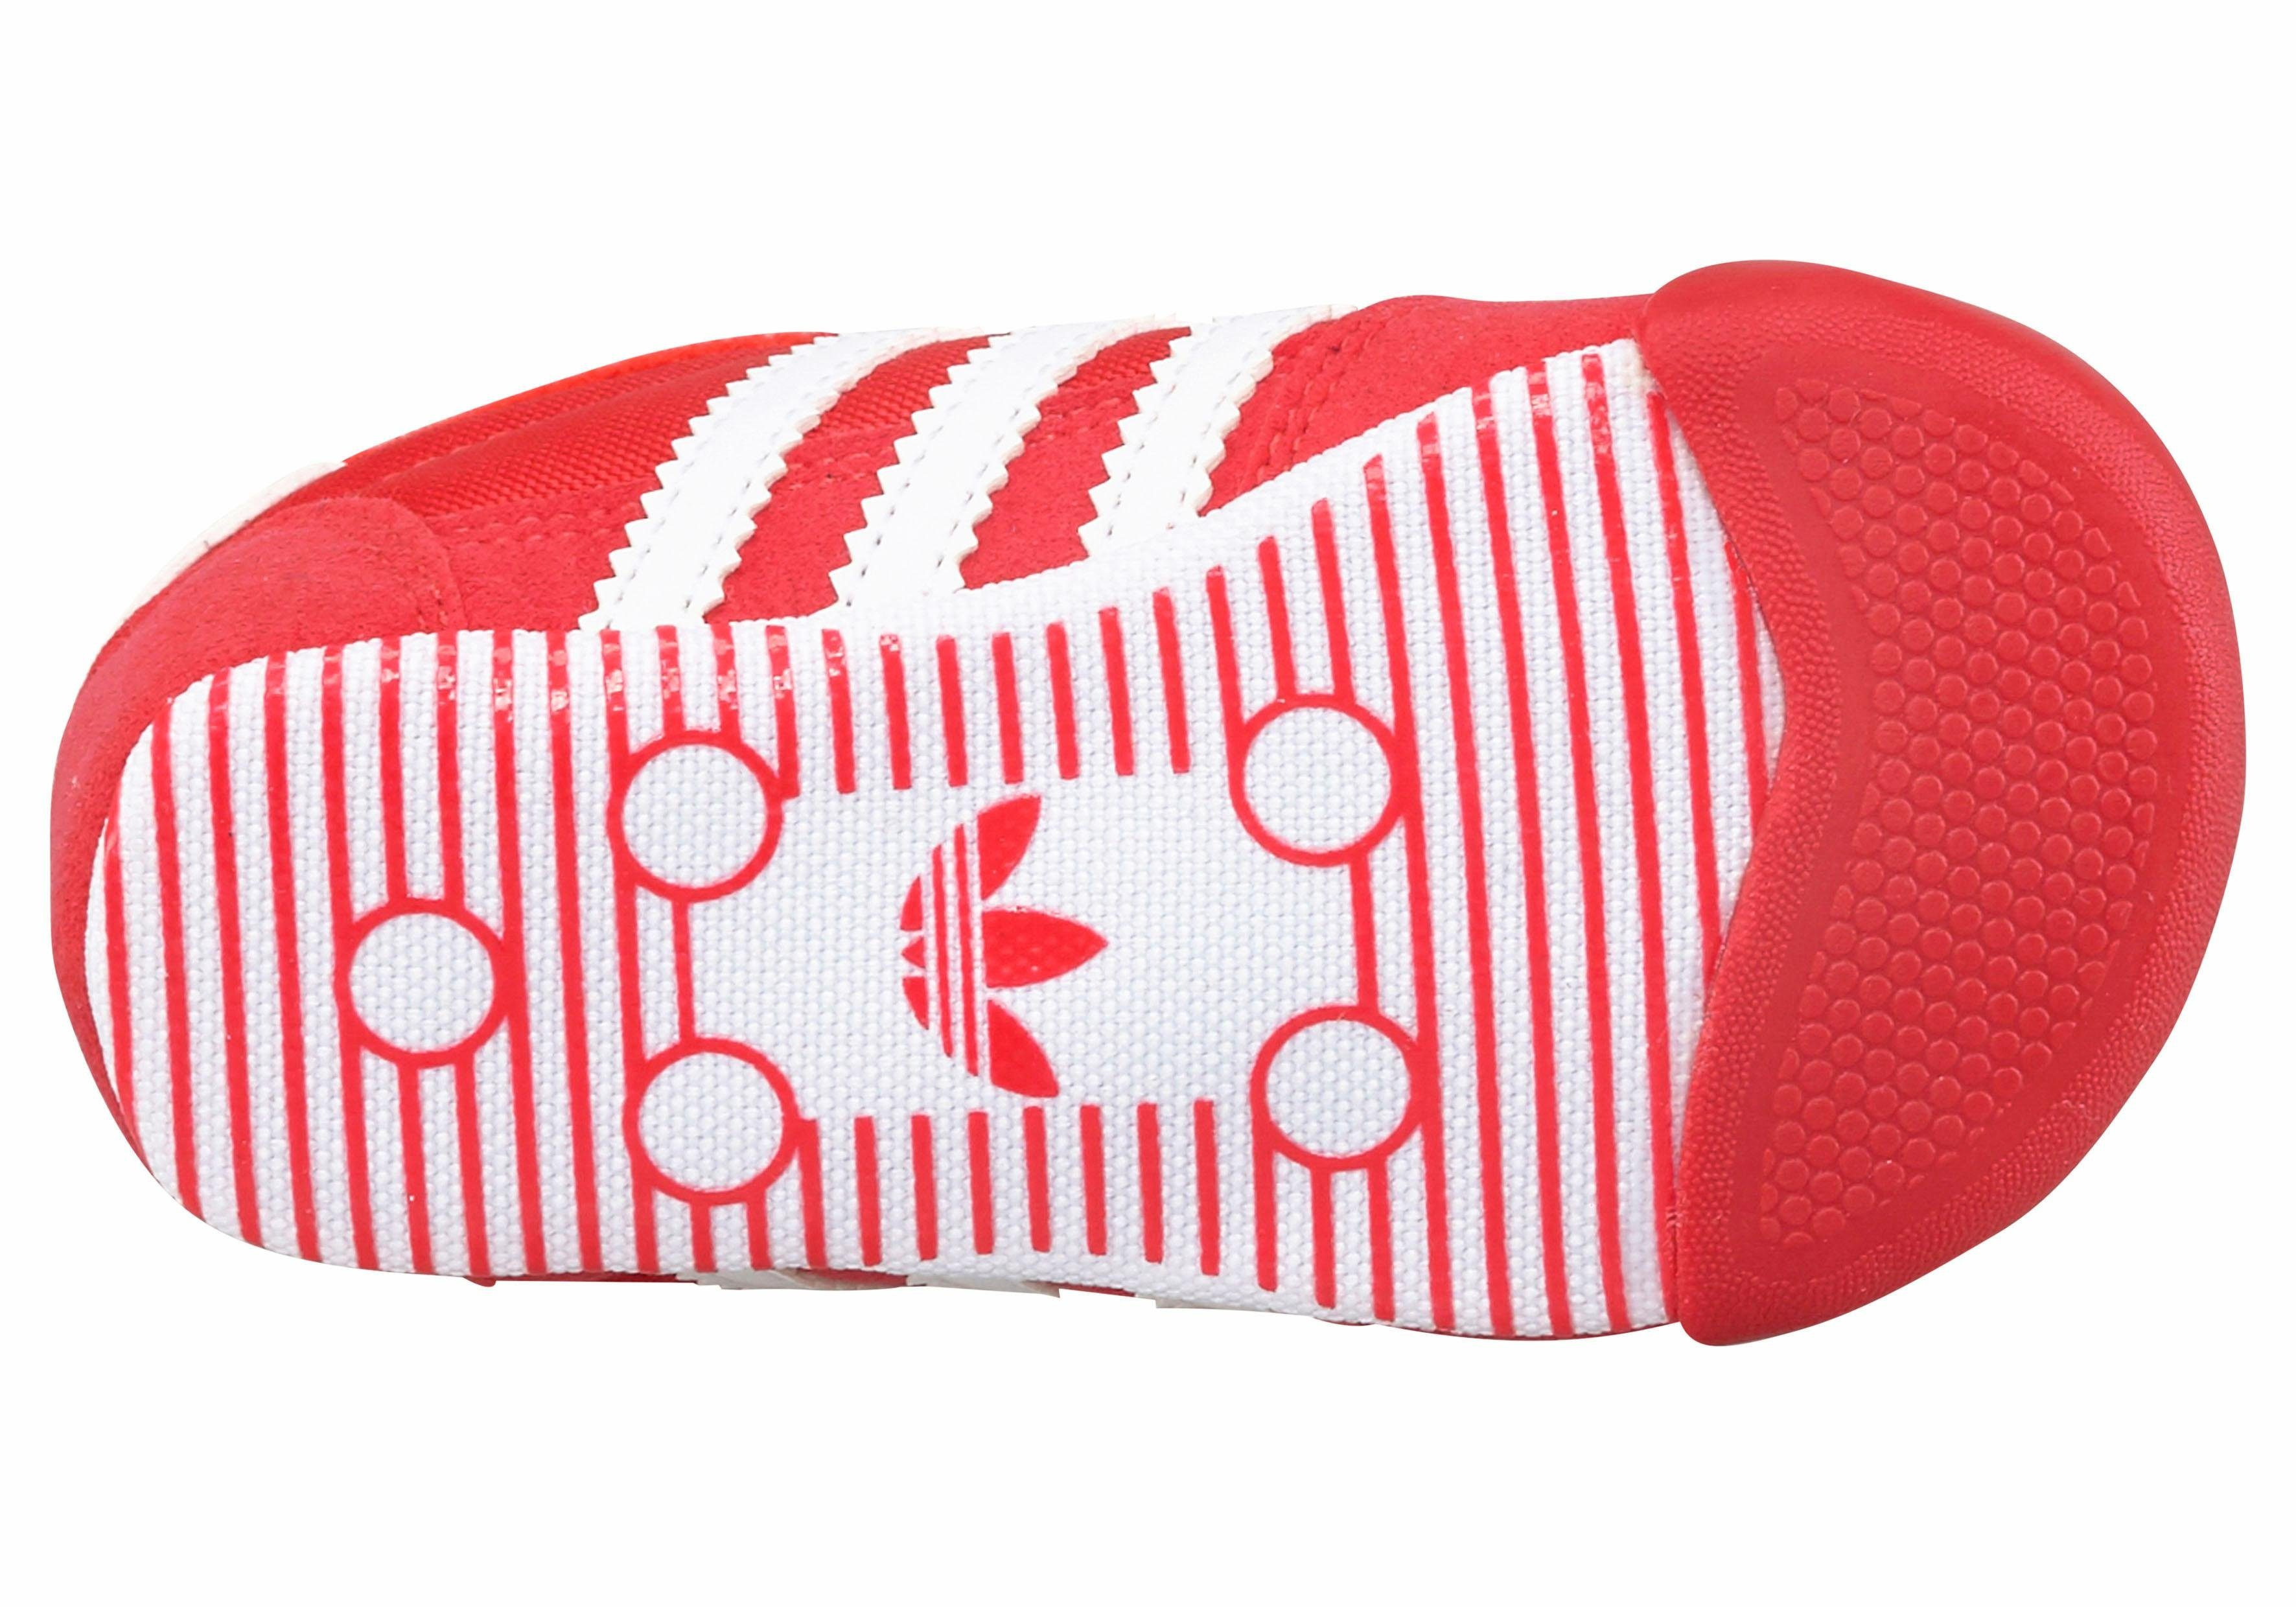 adidas dragon babyschoenen